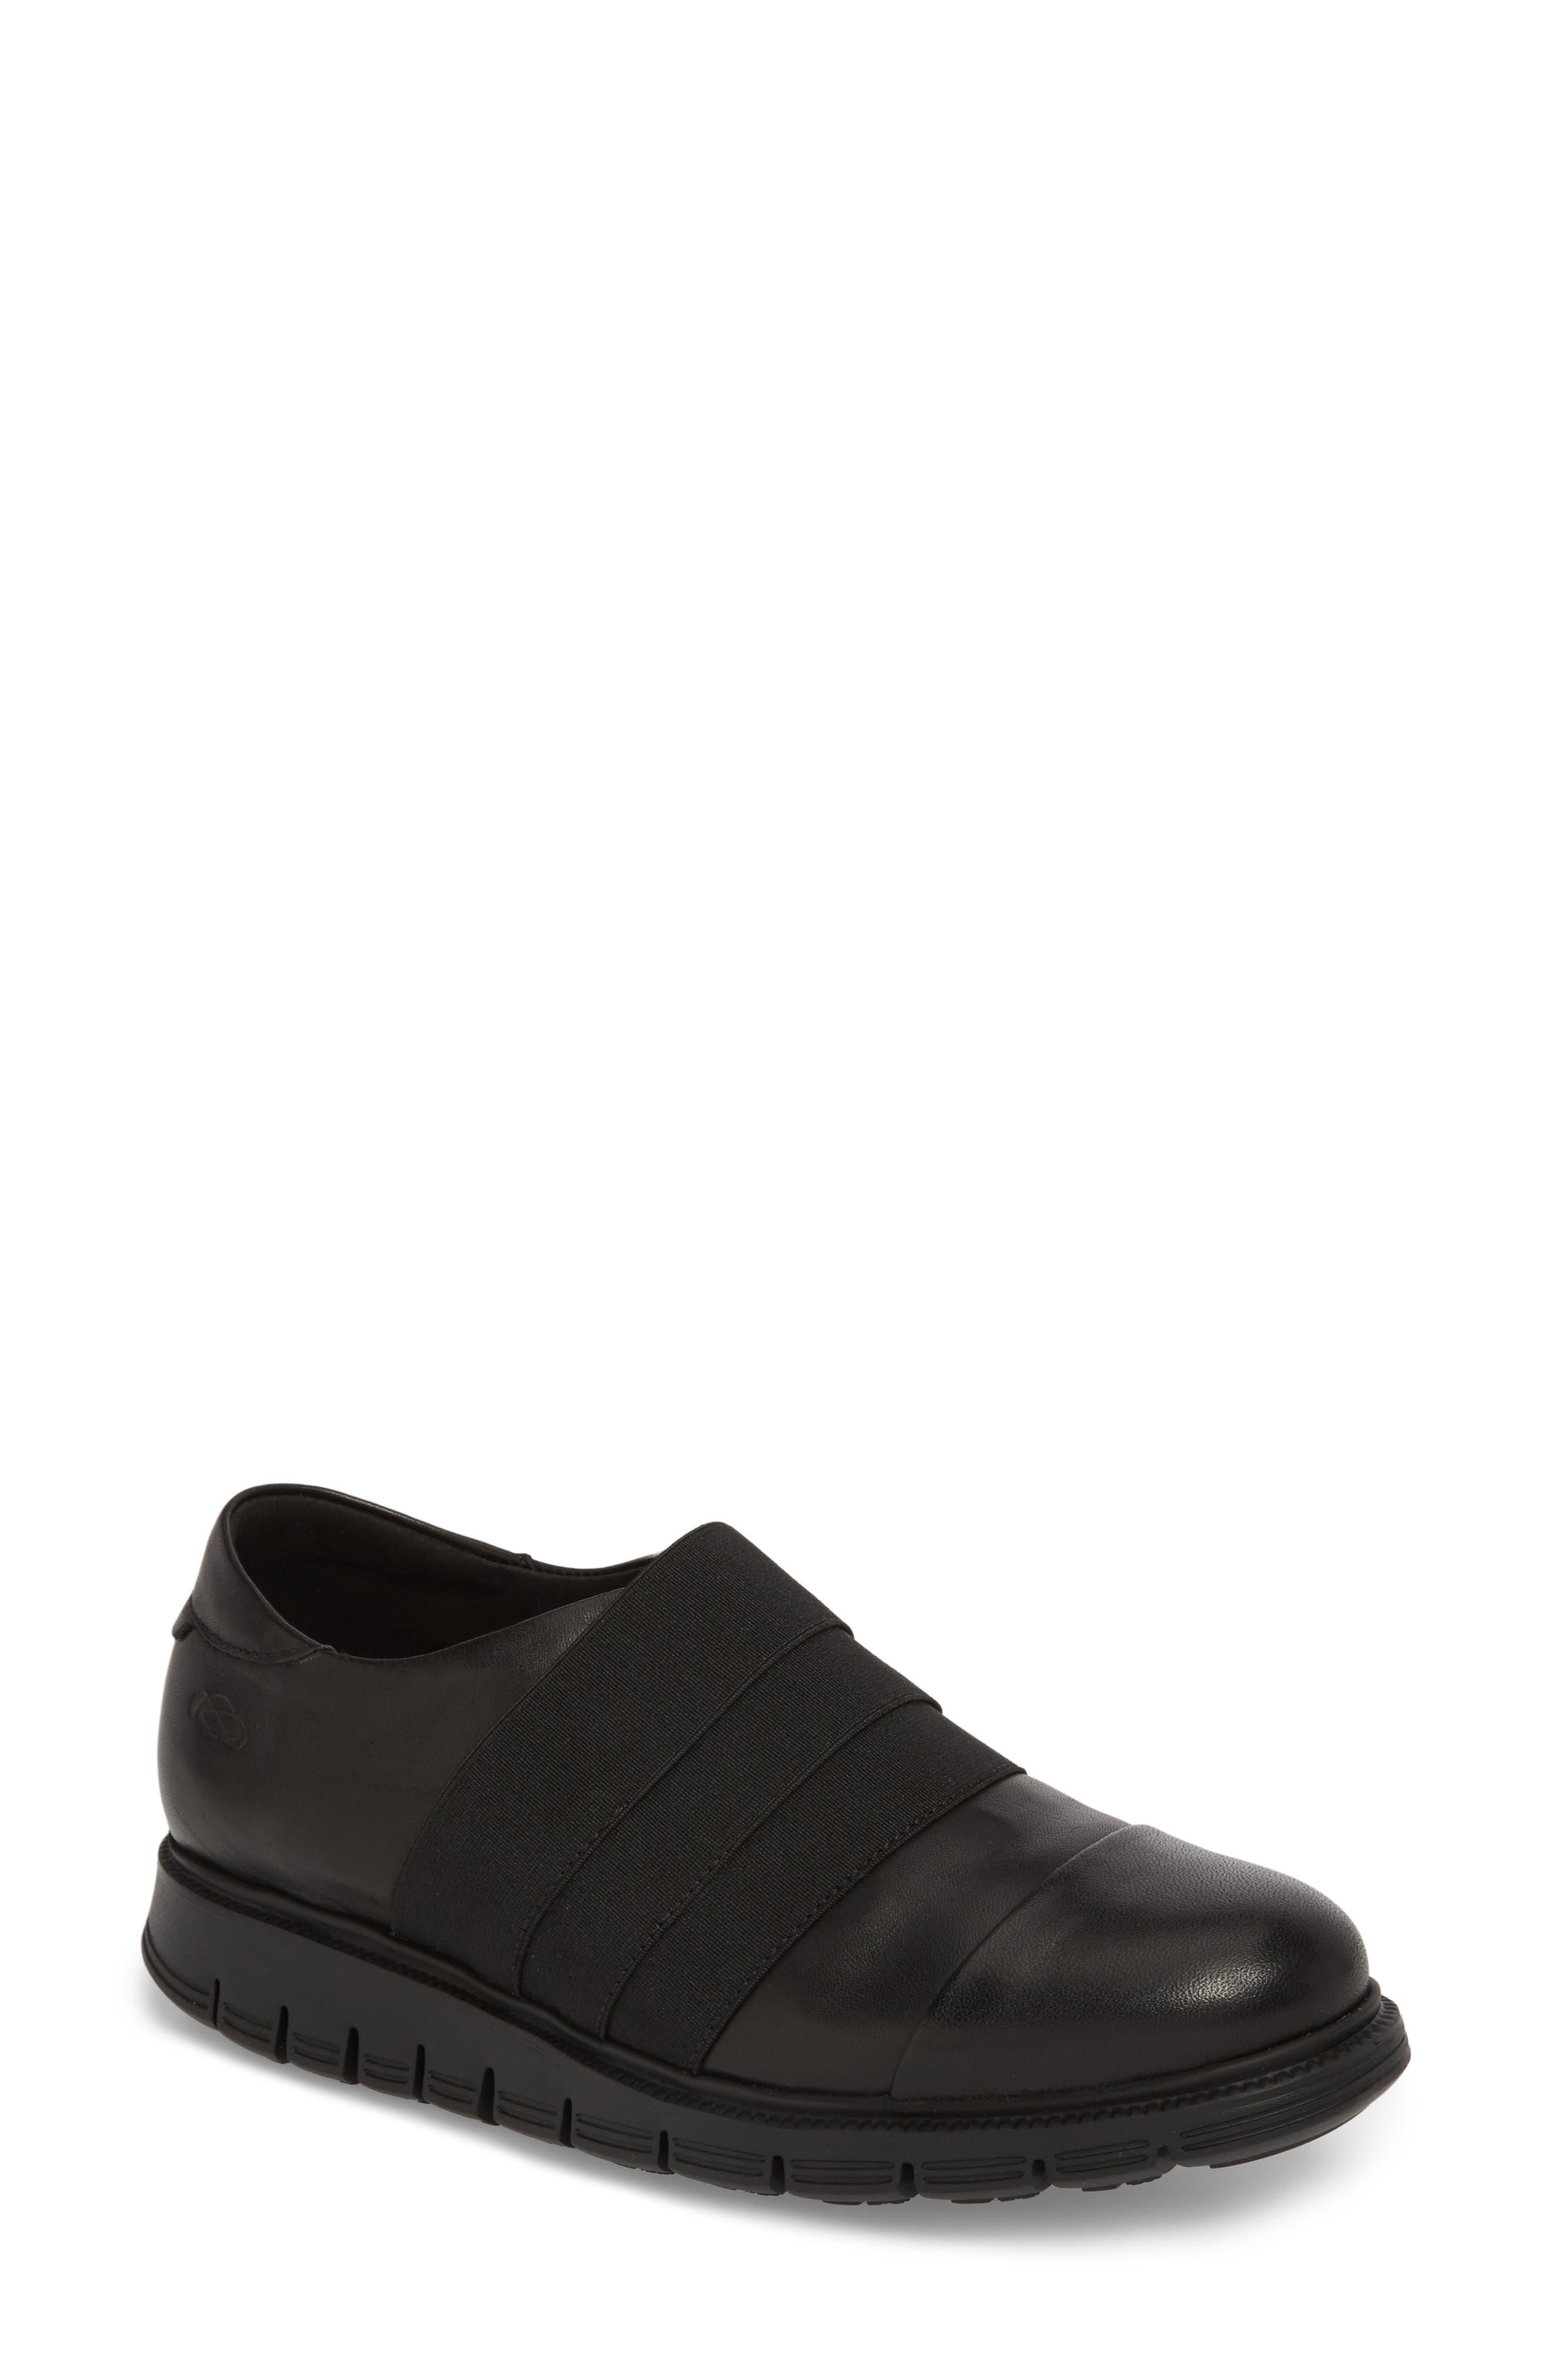 Grace Slip-On Sneaker,                             Main thumbnail 1, color,                             001